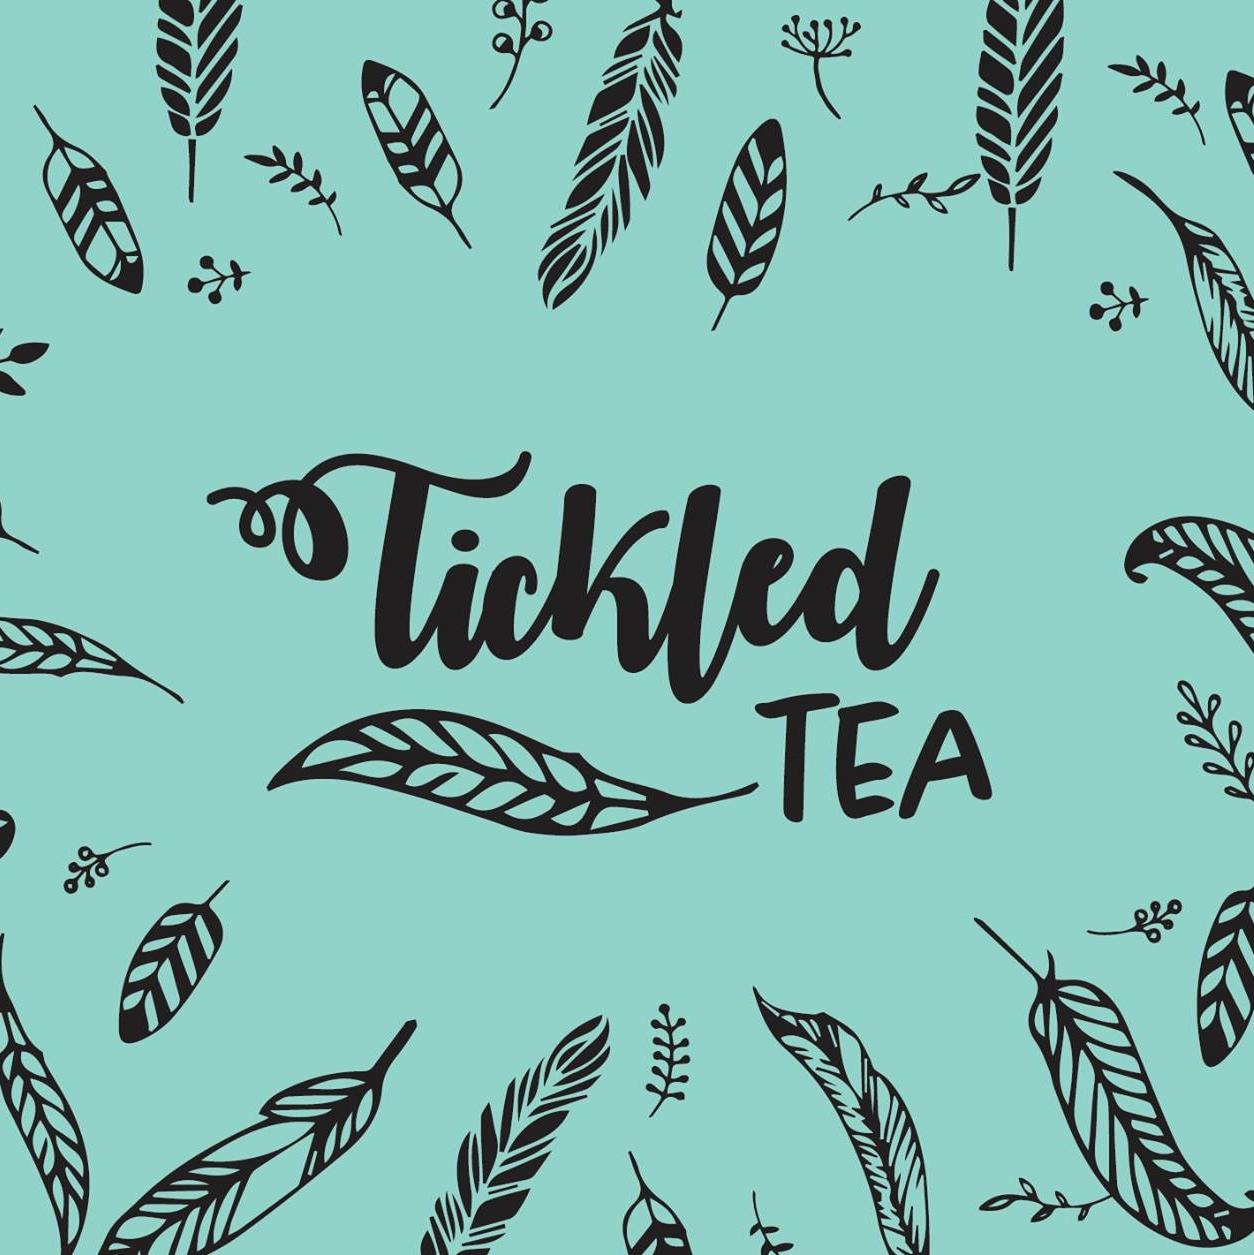 Tickled Tea